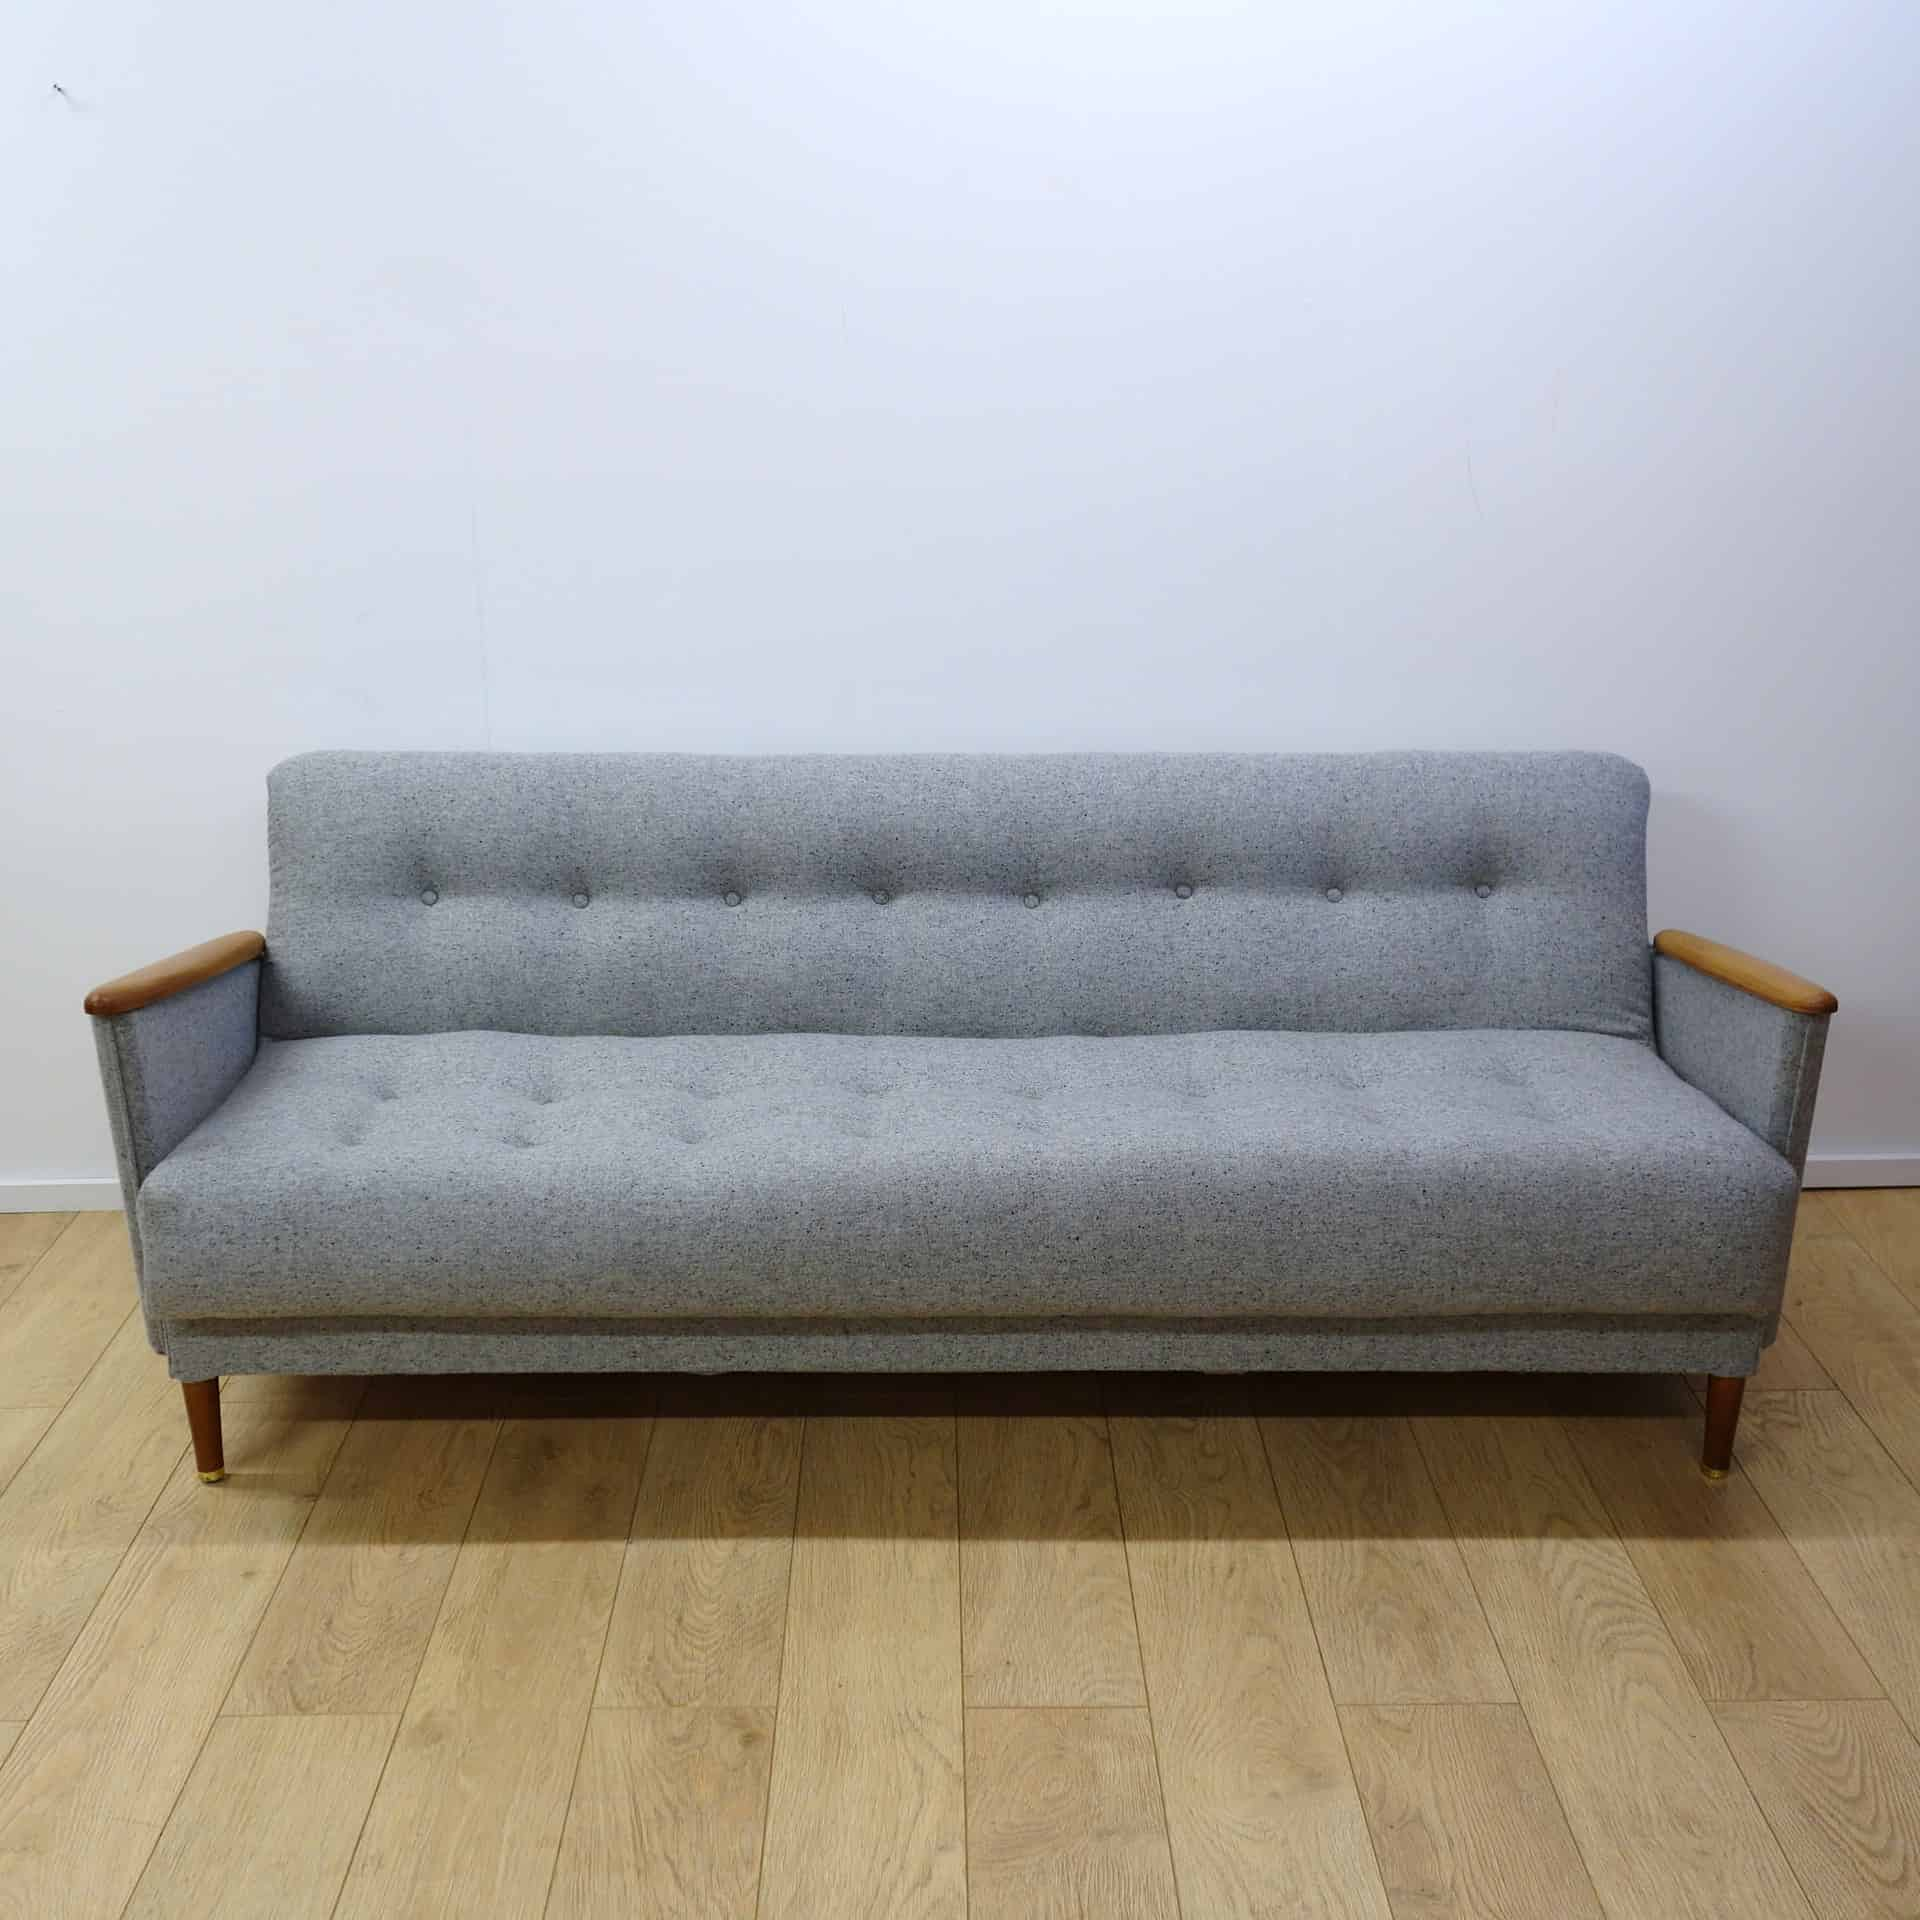 A Mid Century Light Grey Sofa Bed